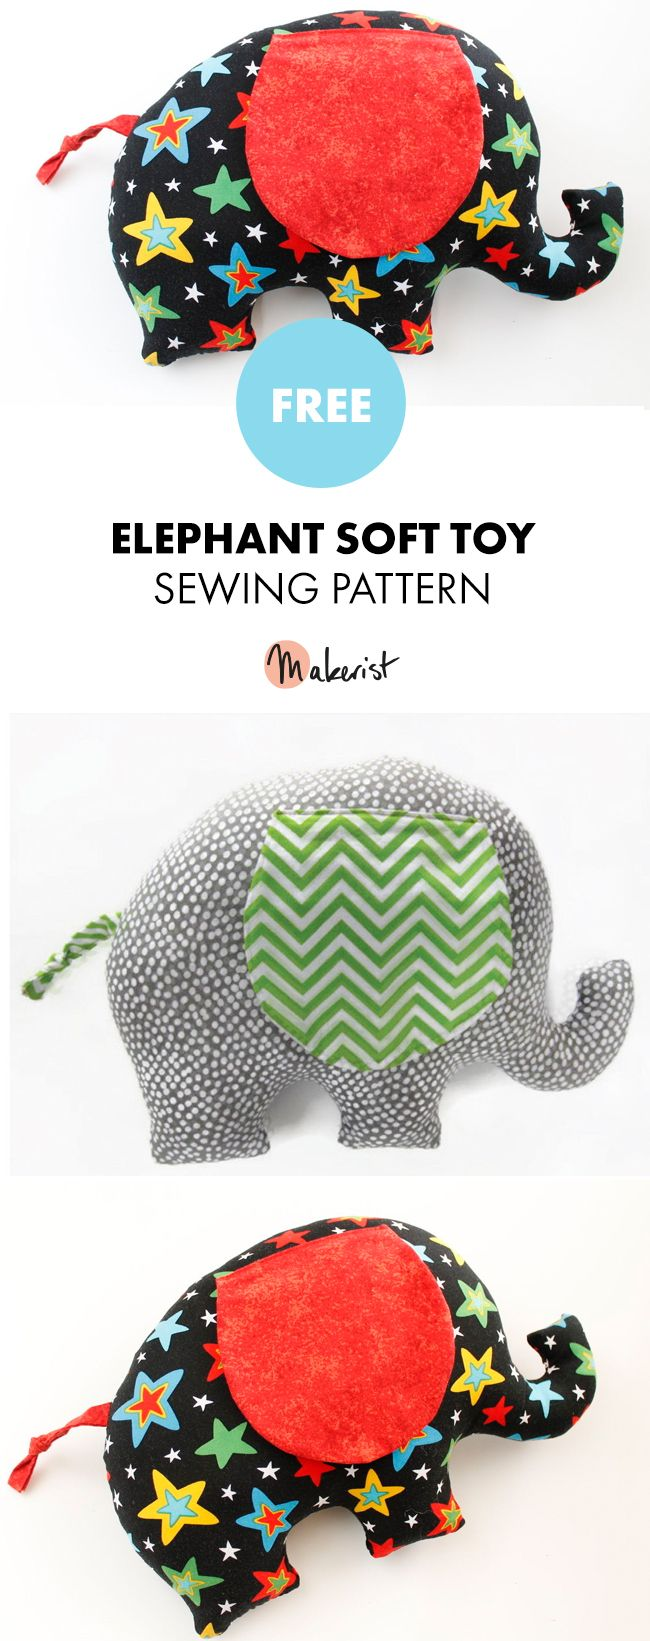 Elephant Soft Toy - Free Sewing Patterns via Makerist.com